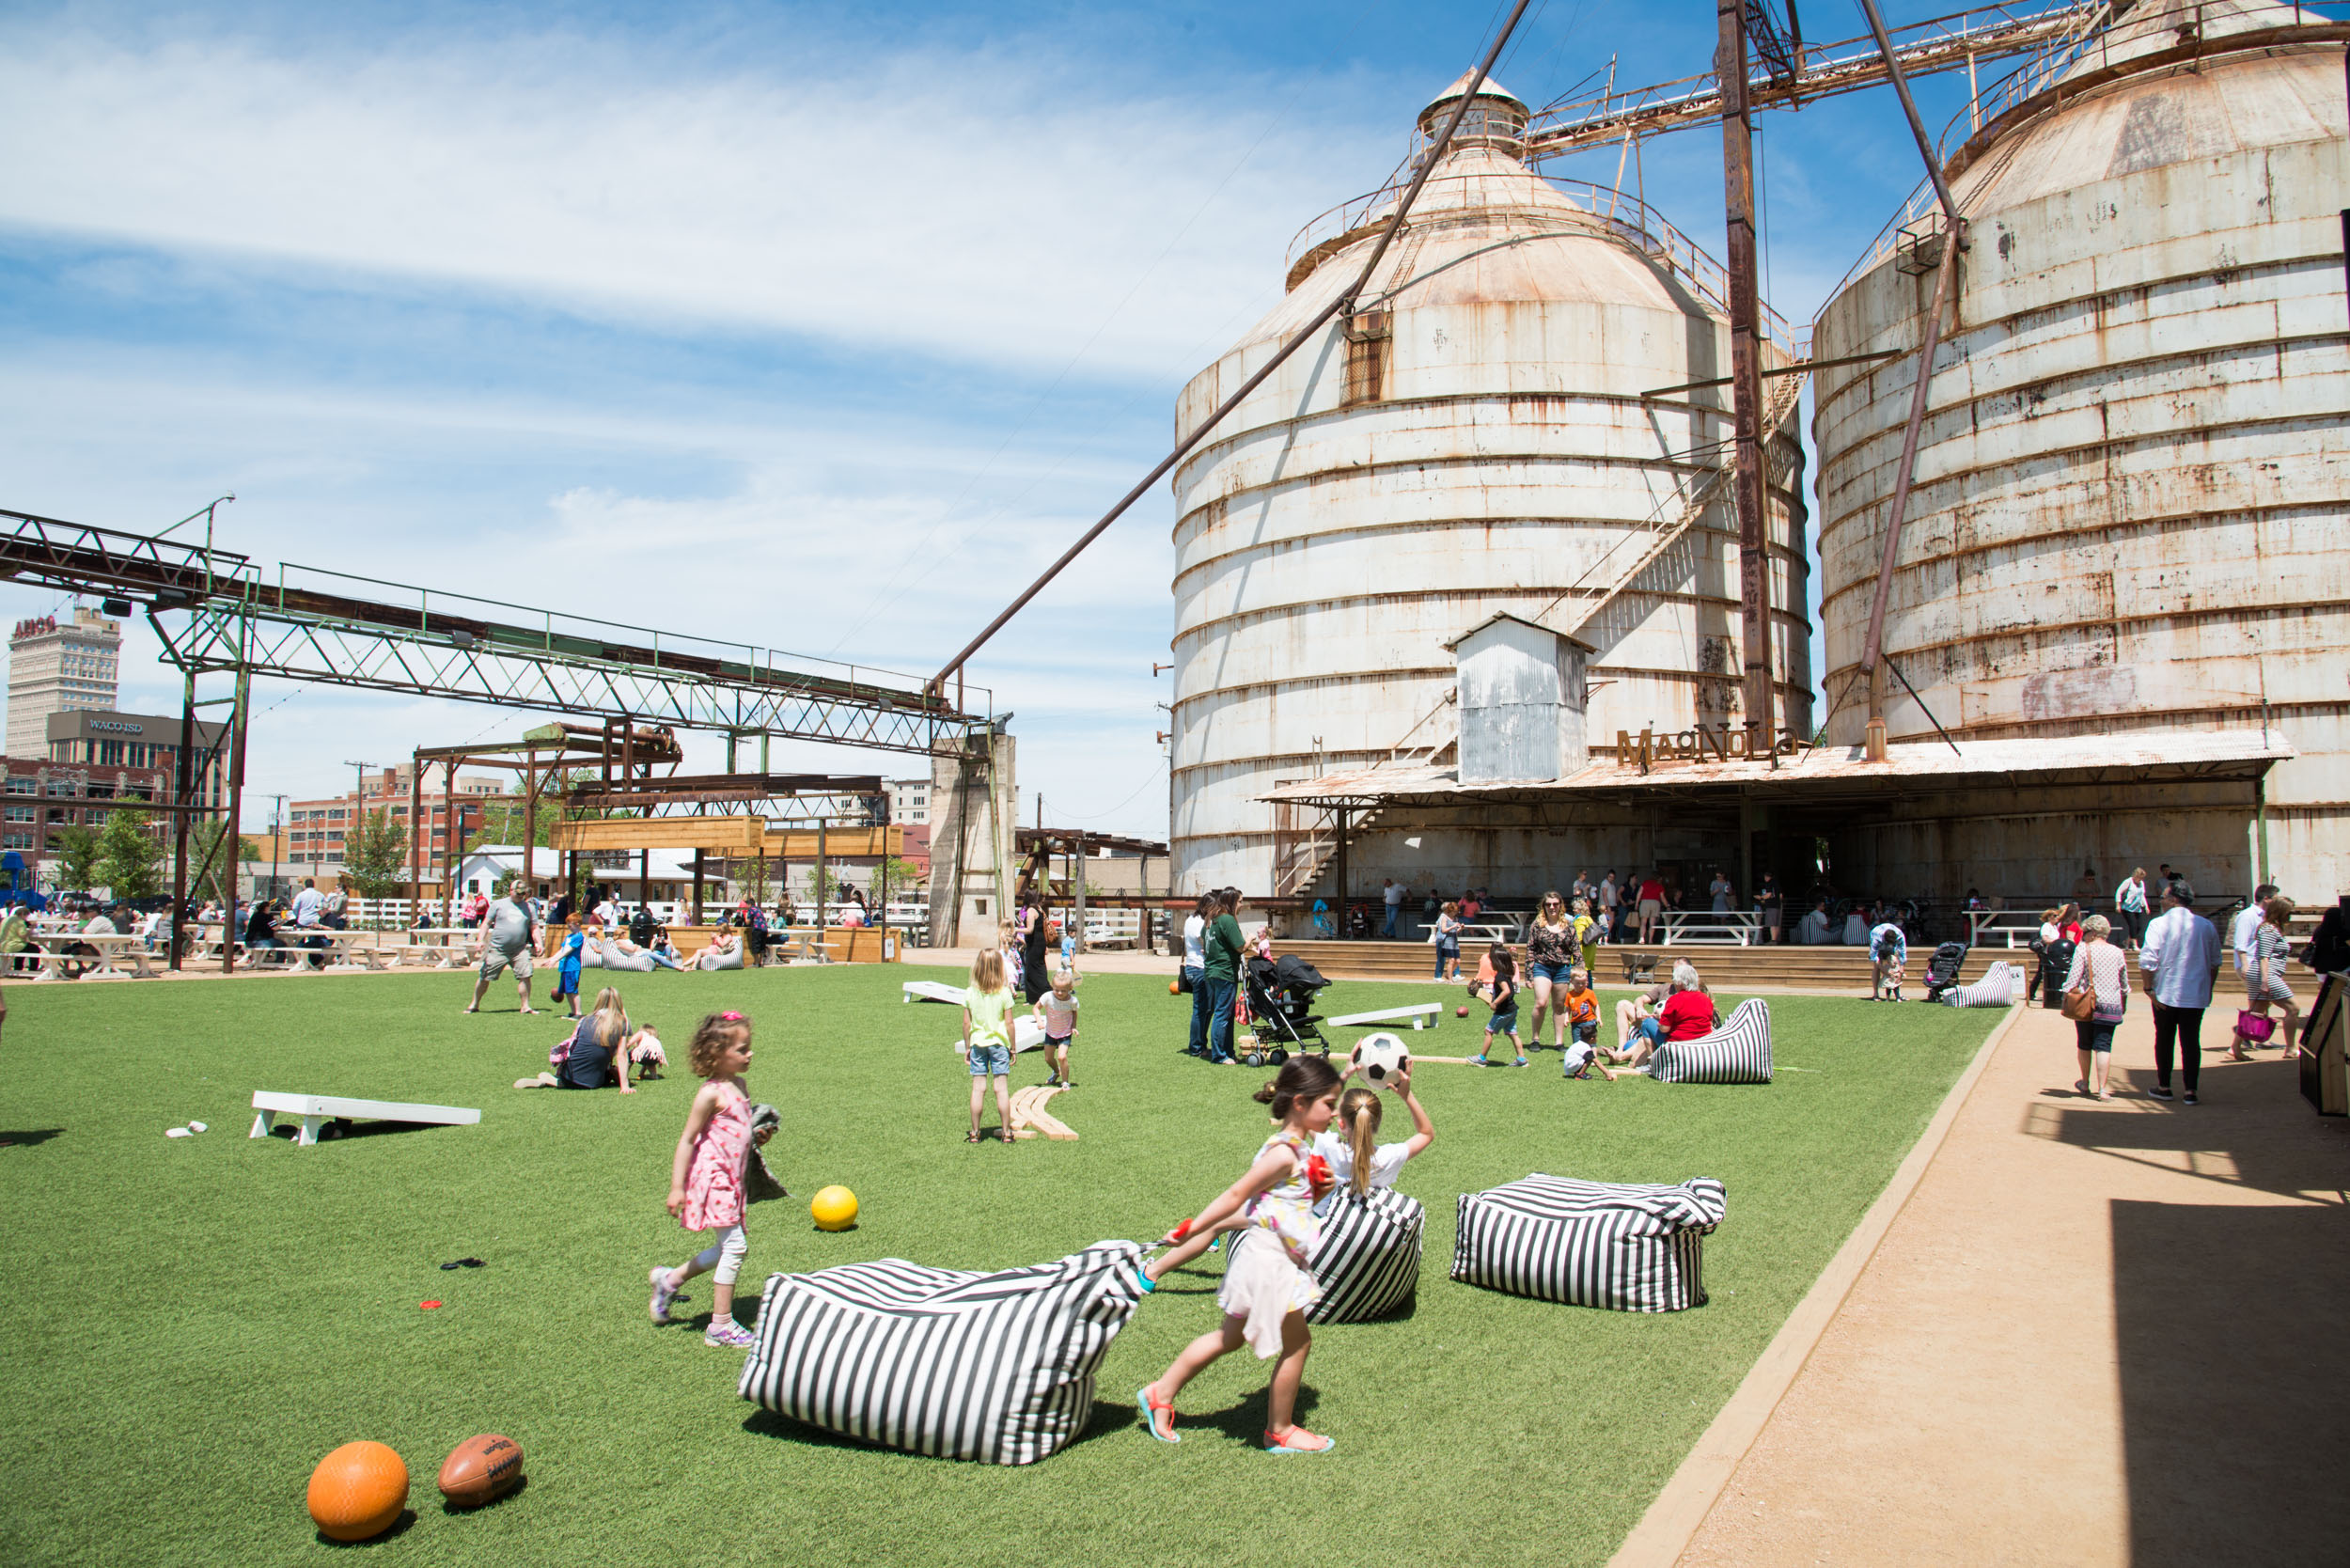 Can Waco's Economic Boom Survive The End Of 'Fixer Upper?'